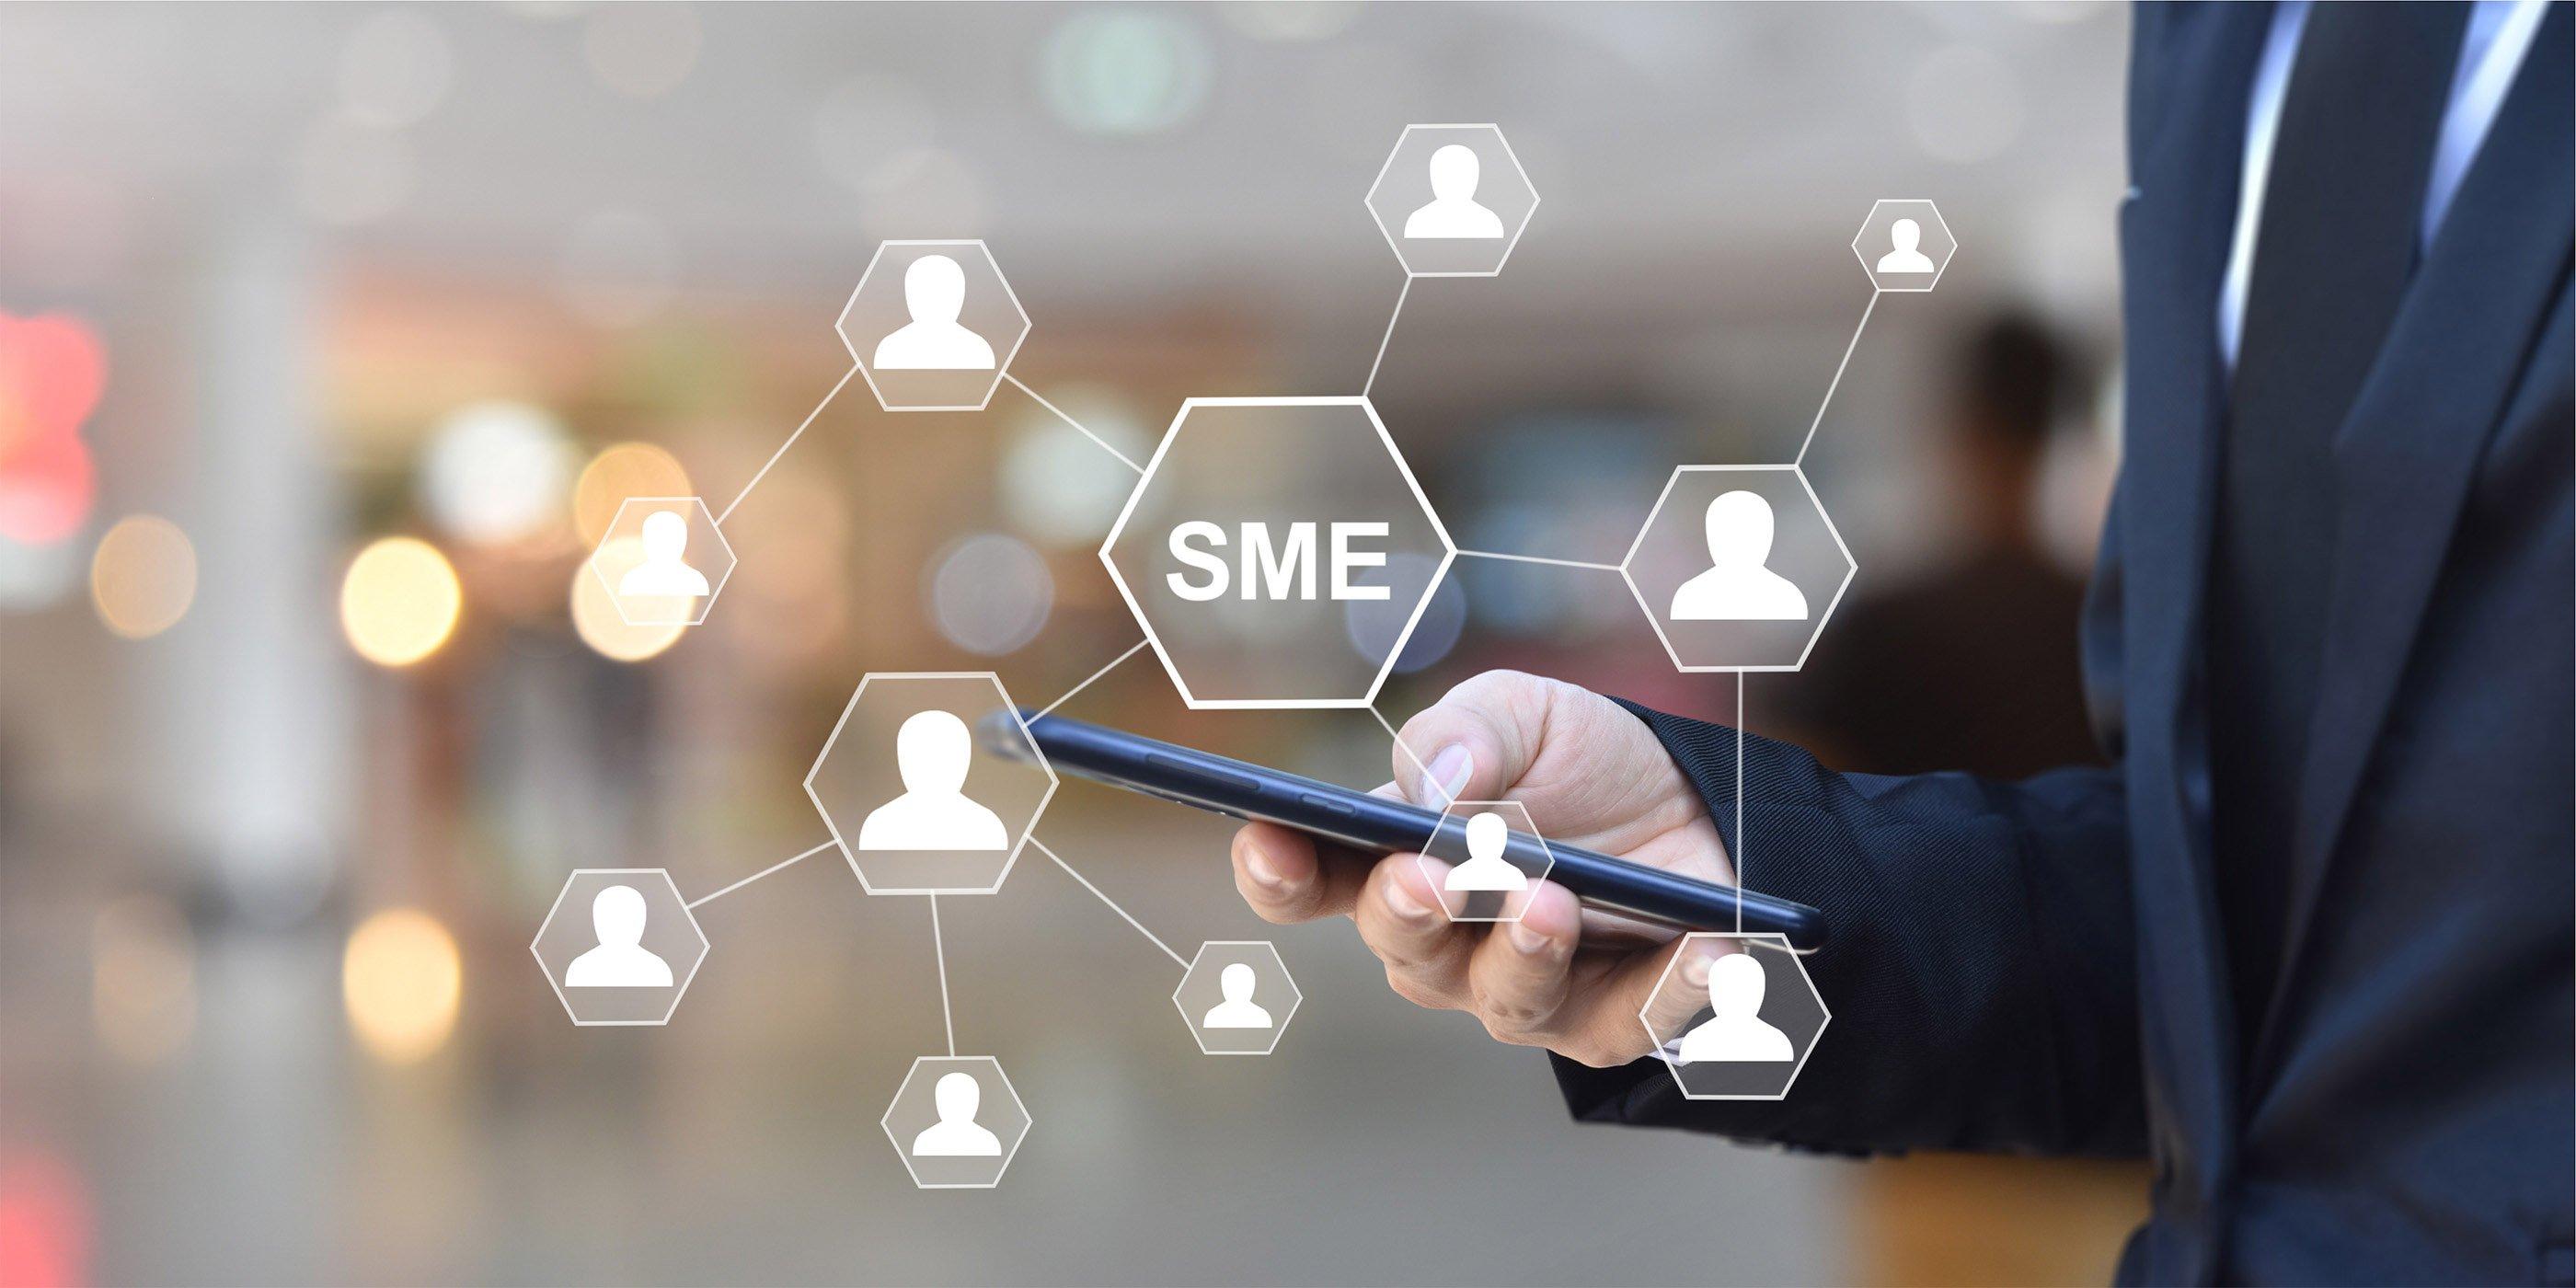 SME Lead image